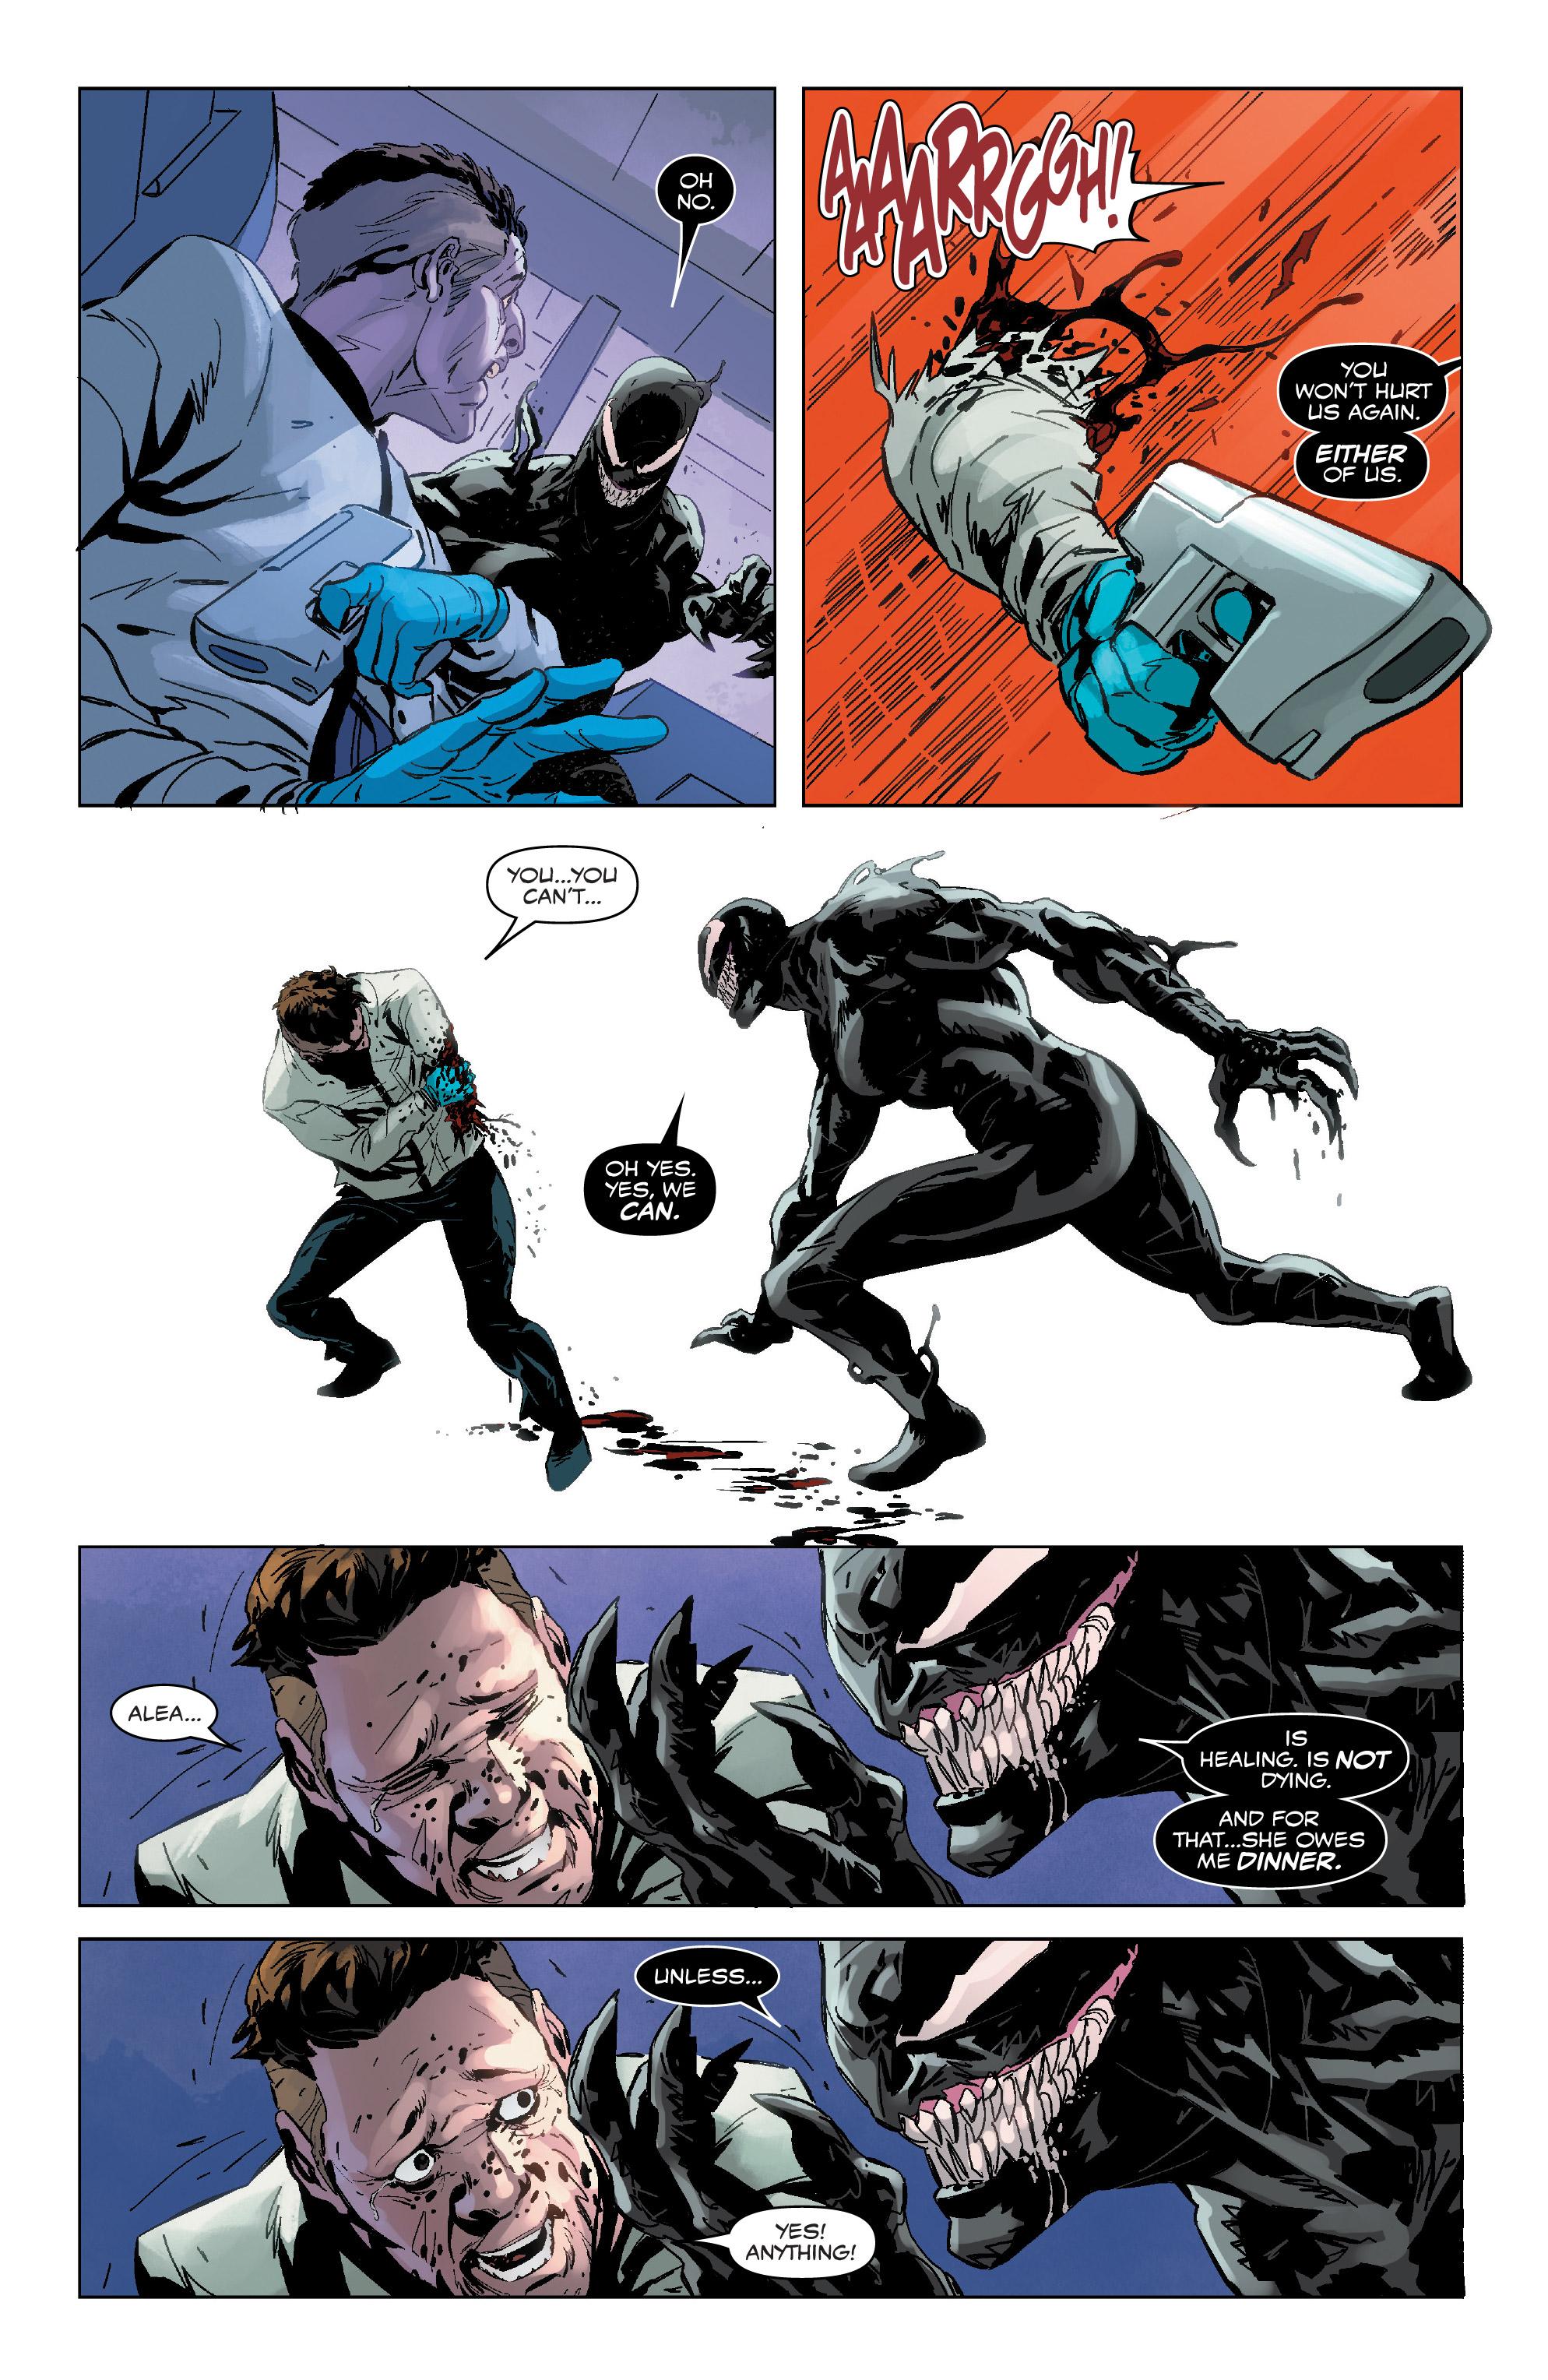 Venom 2099 (2019) Chapter 1 - Page 1